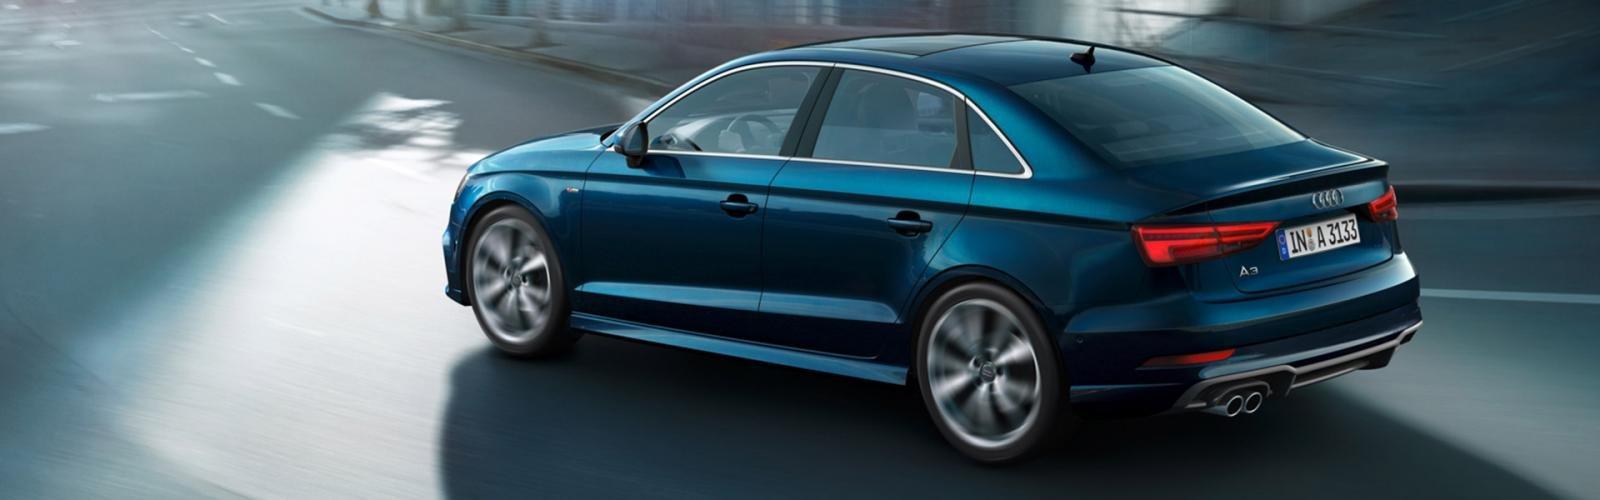 Đánh giá xe Audi A3